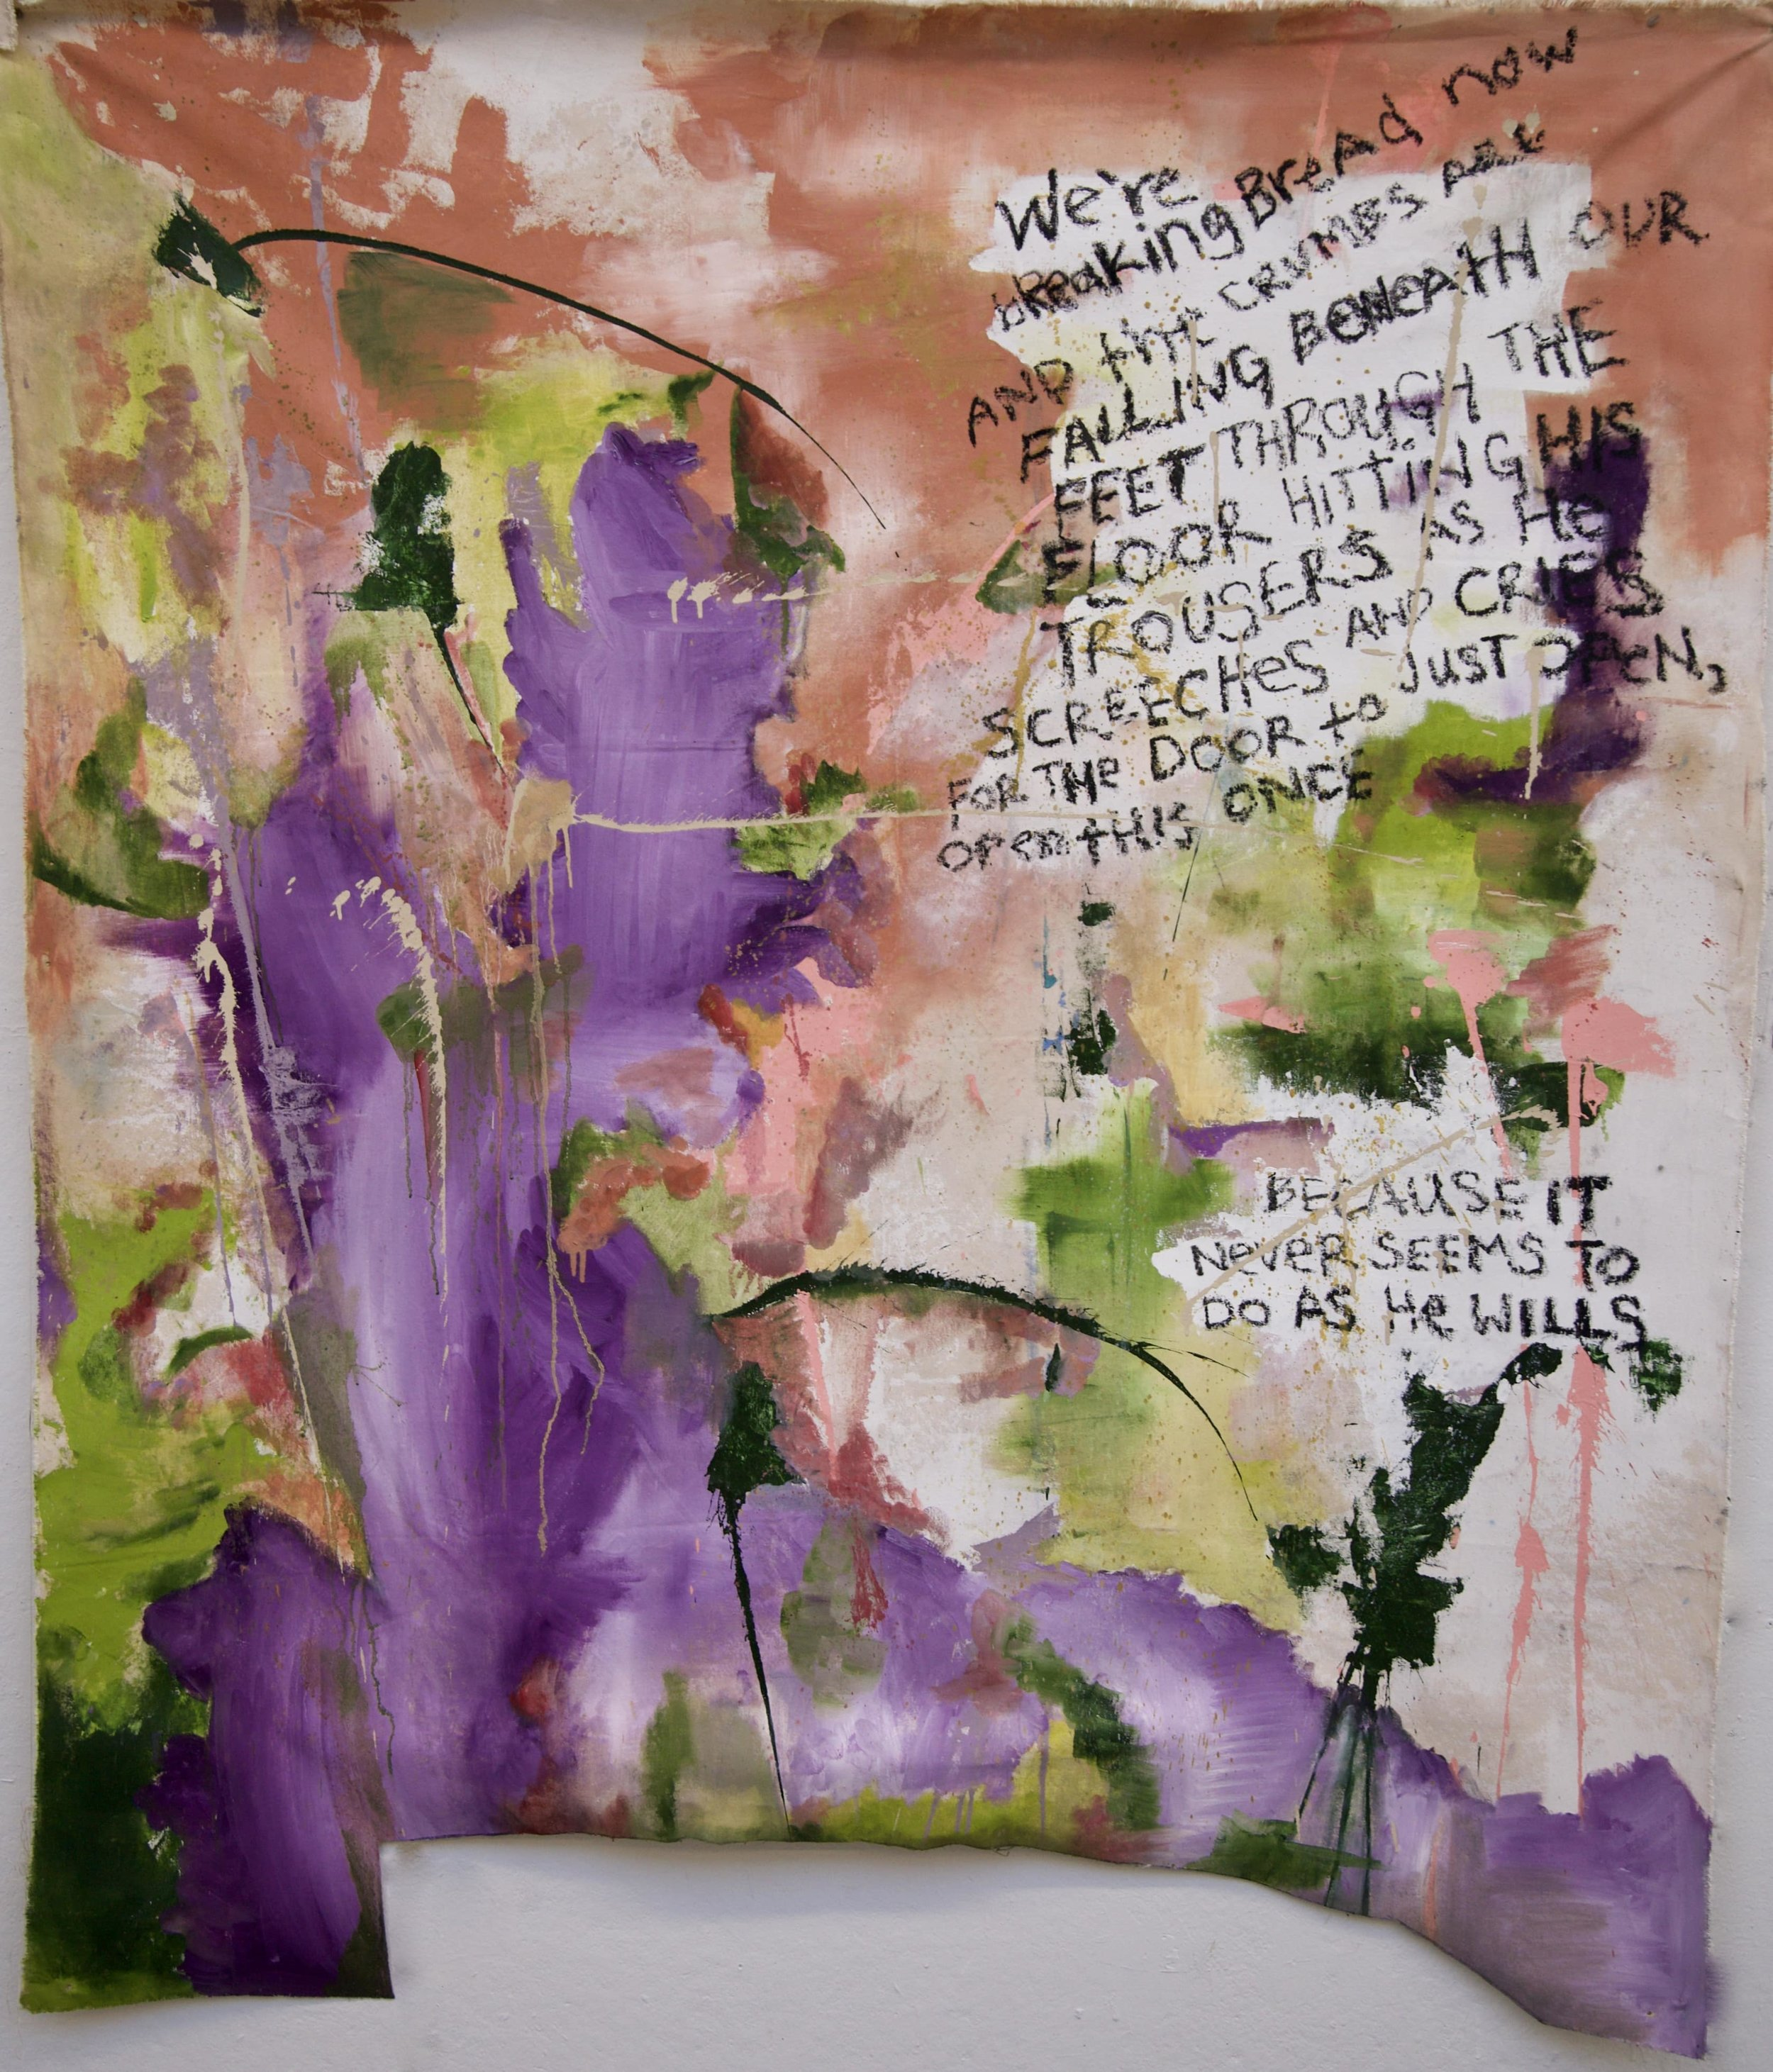 Downstairs Neighbour, 2018, oil on canvas, 6 x 6.5 feet, $1150